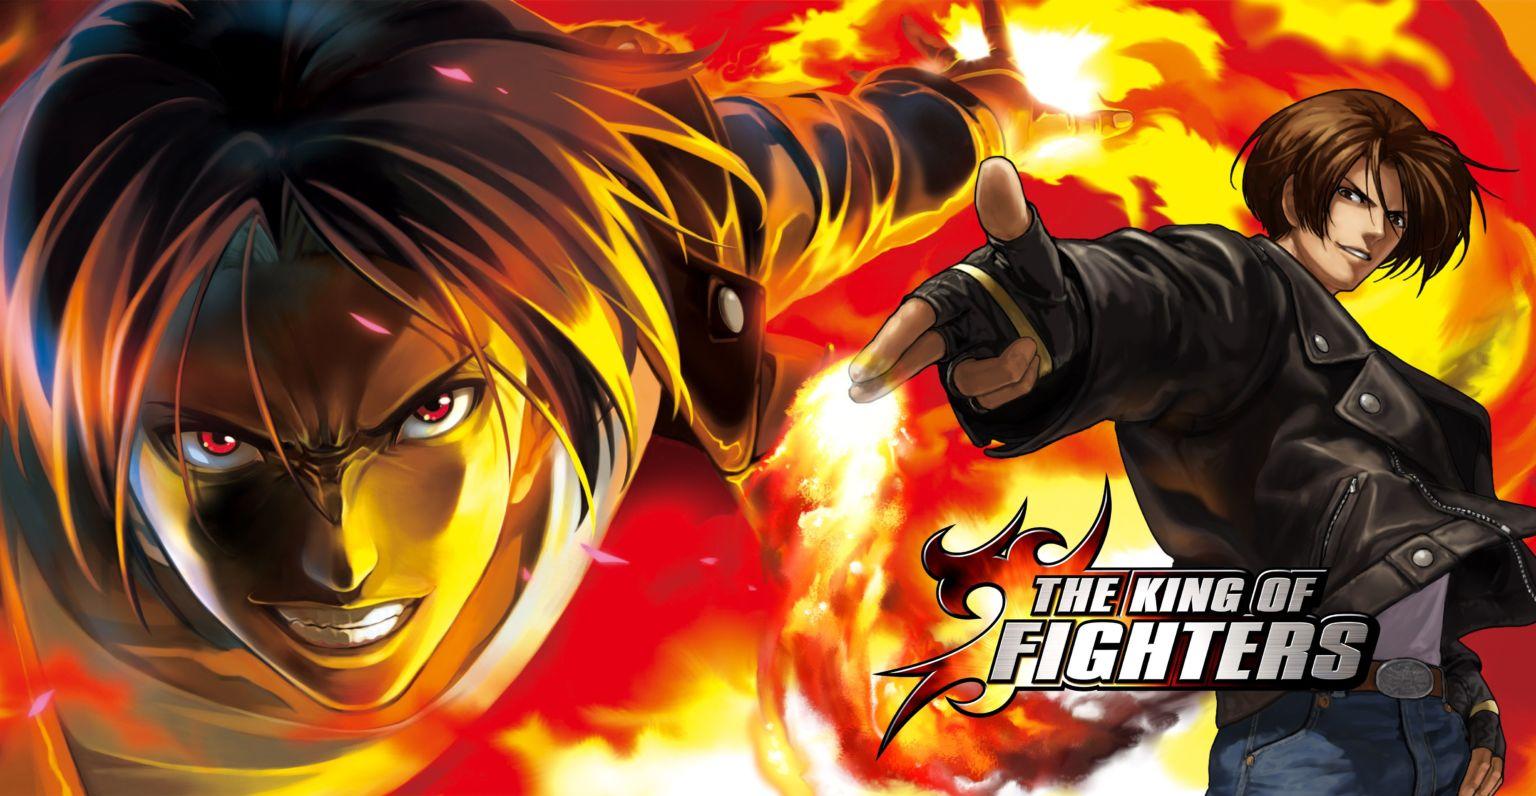 The King Of Fighters একটি অসাধারণ Action Game রিভিউ